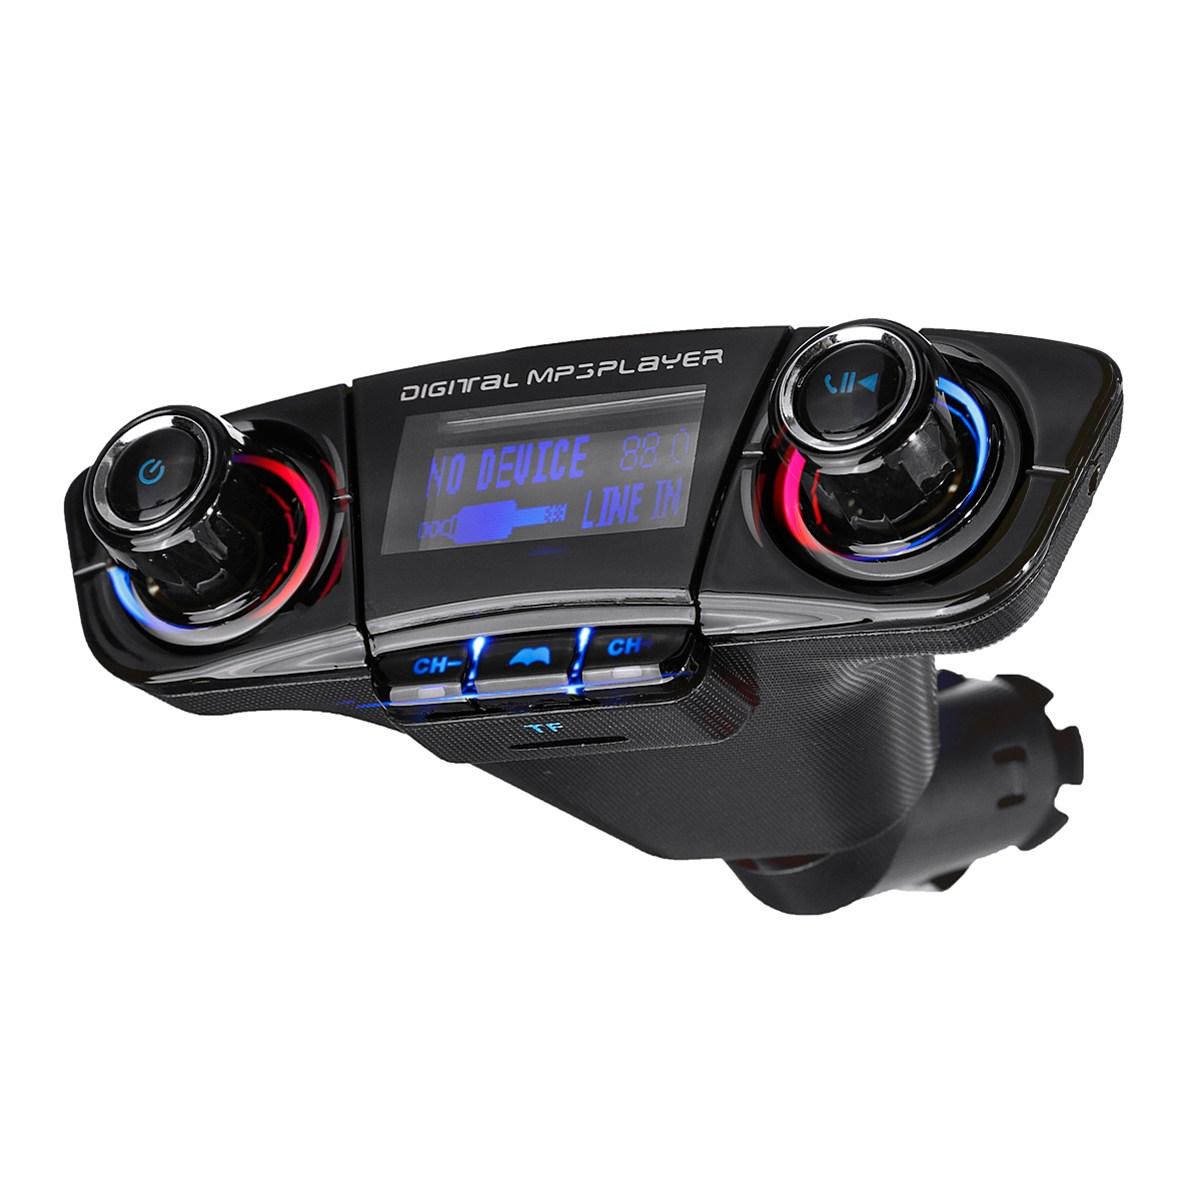 INSMA 자동차 오디오 MP3 플레이어, SKUD14901